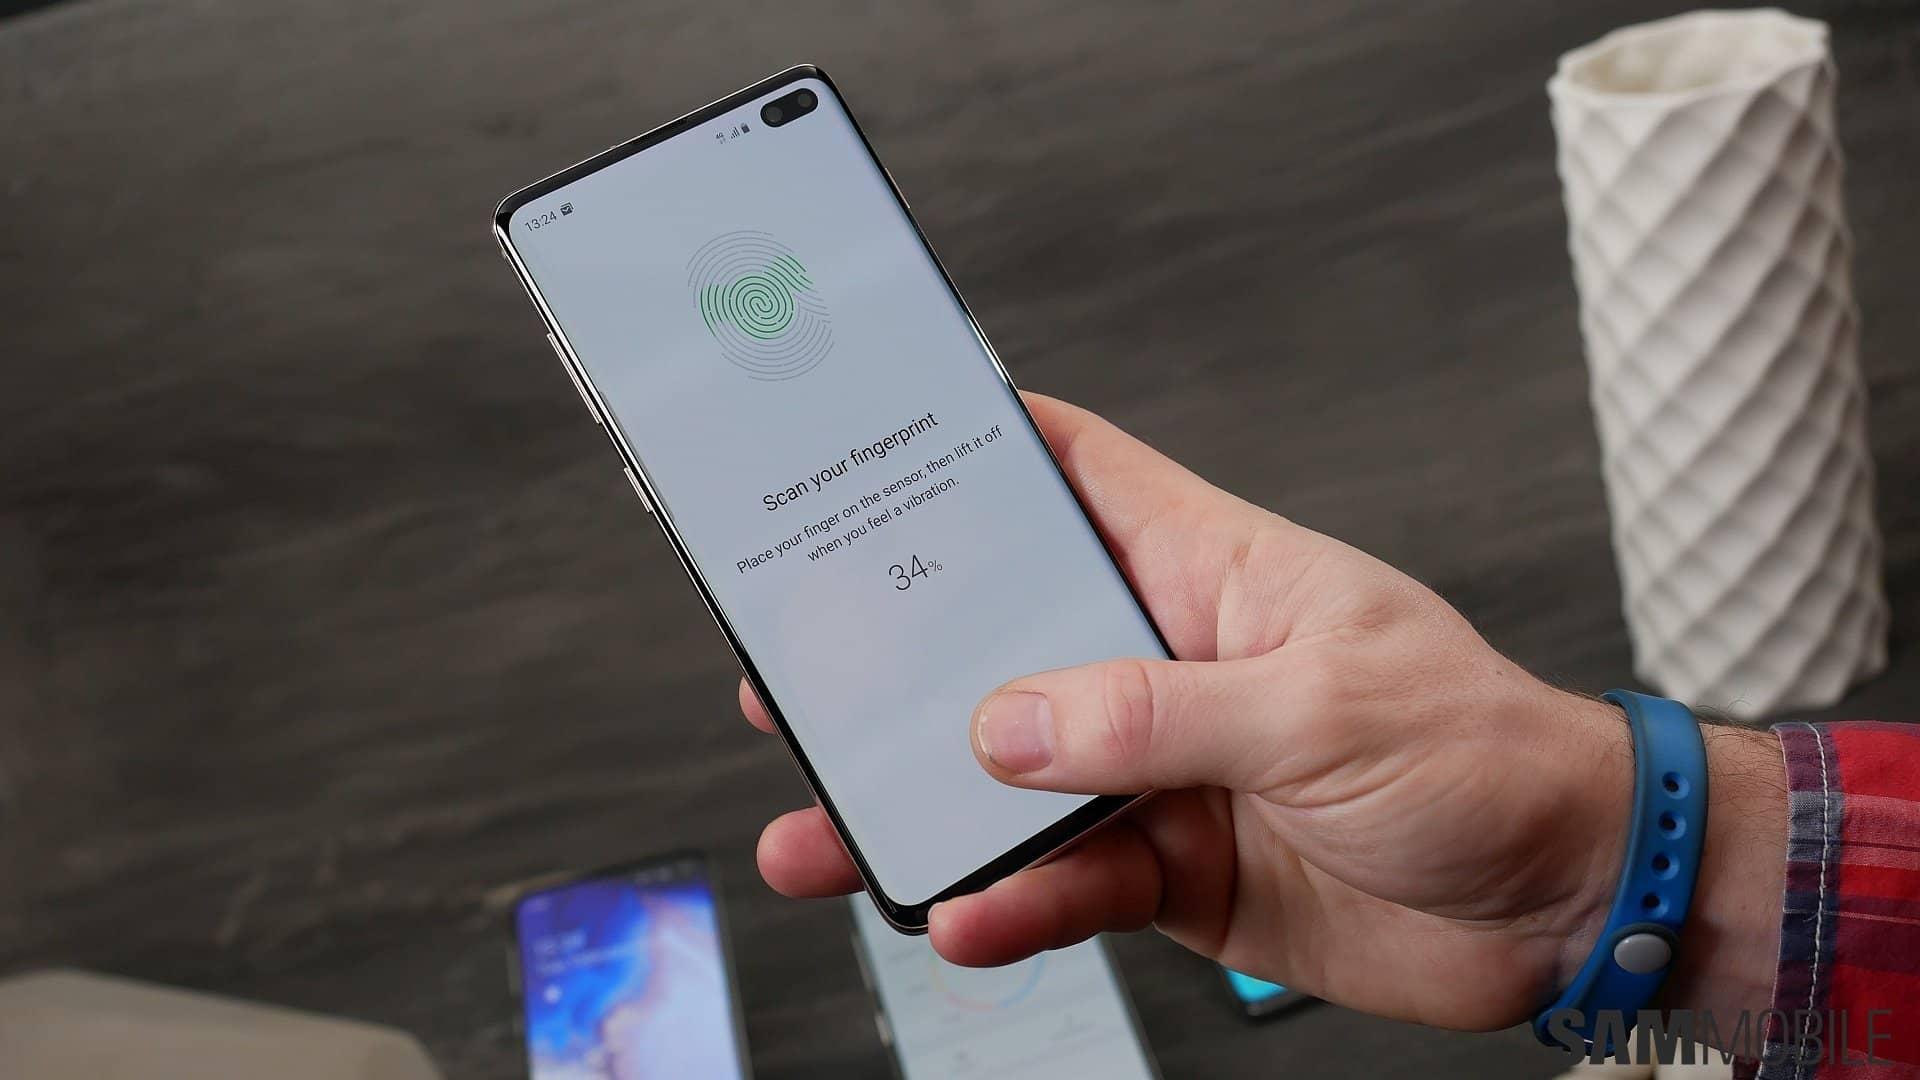 Android vs iPhone - in-screen fingerprint sensors